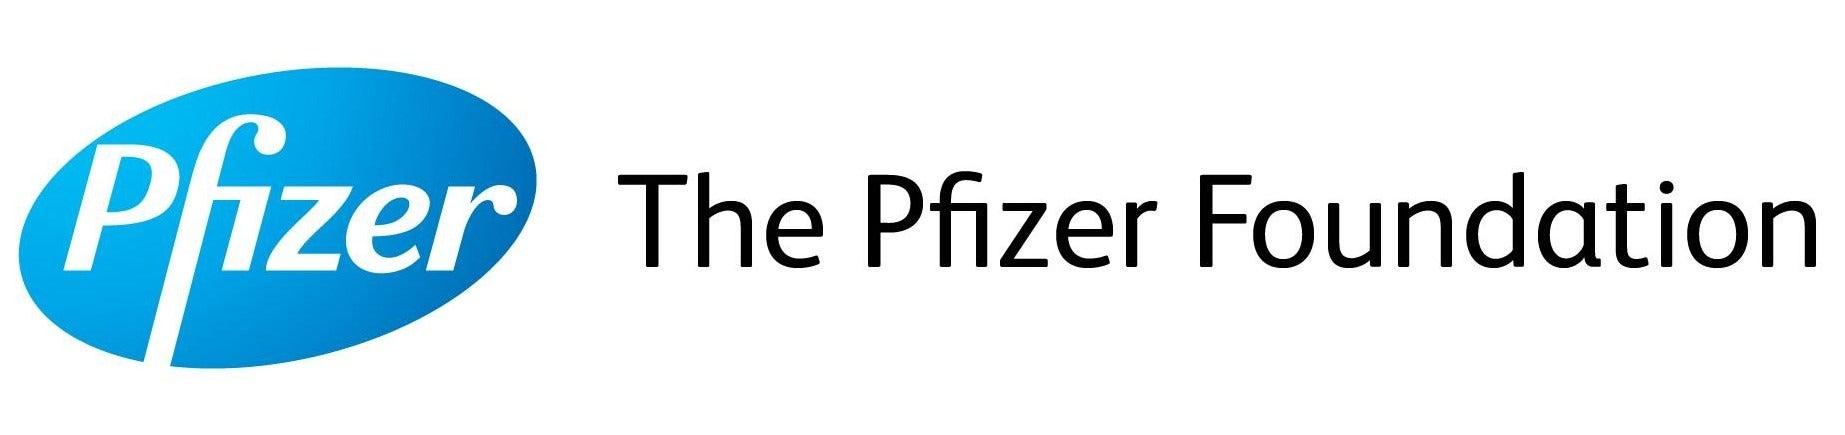 ThePfizerFoundation_Logo_2018_compressed